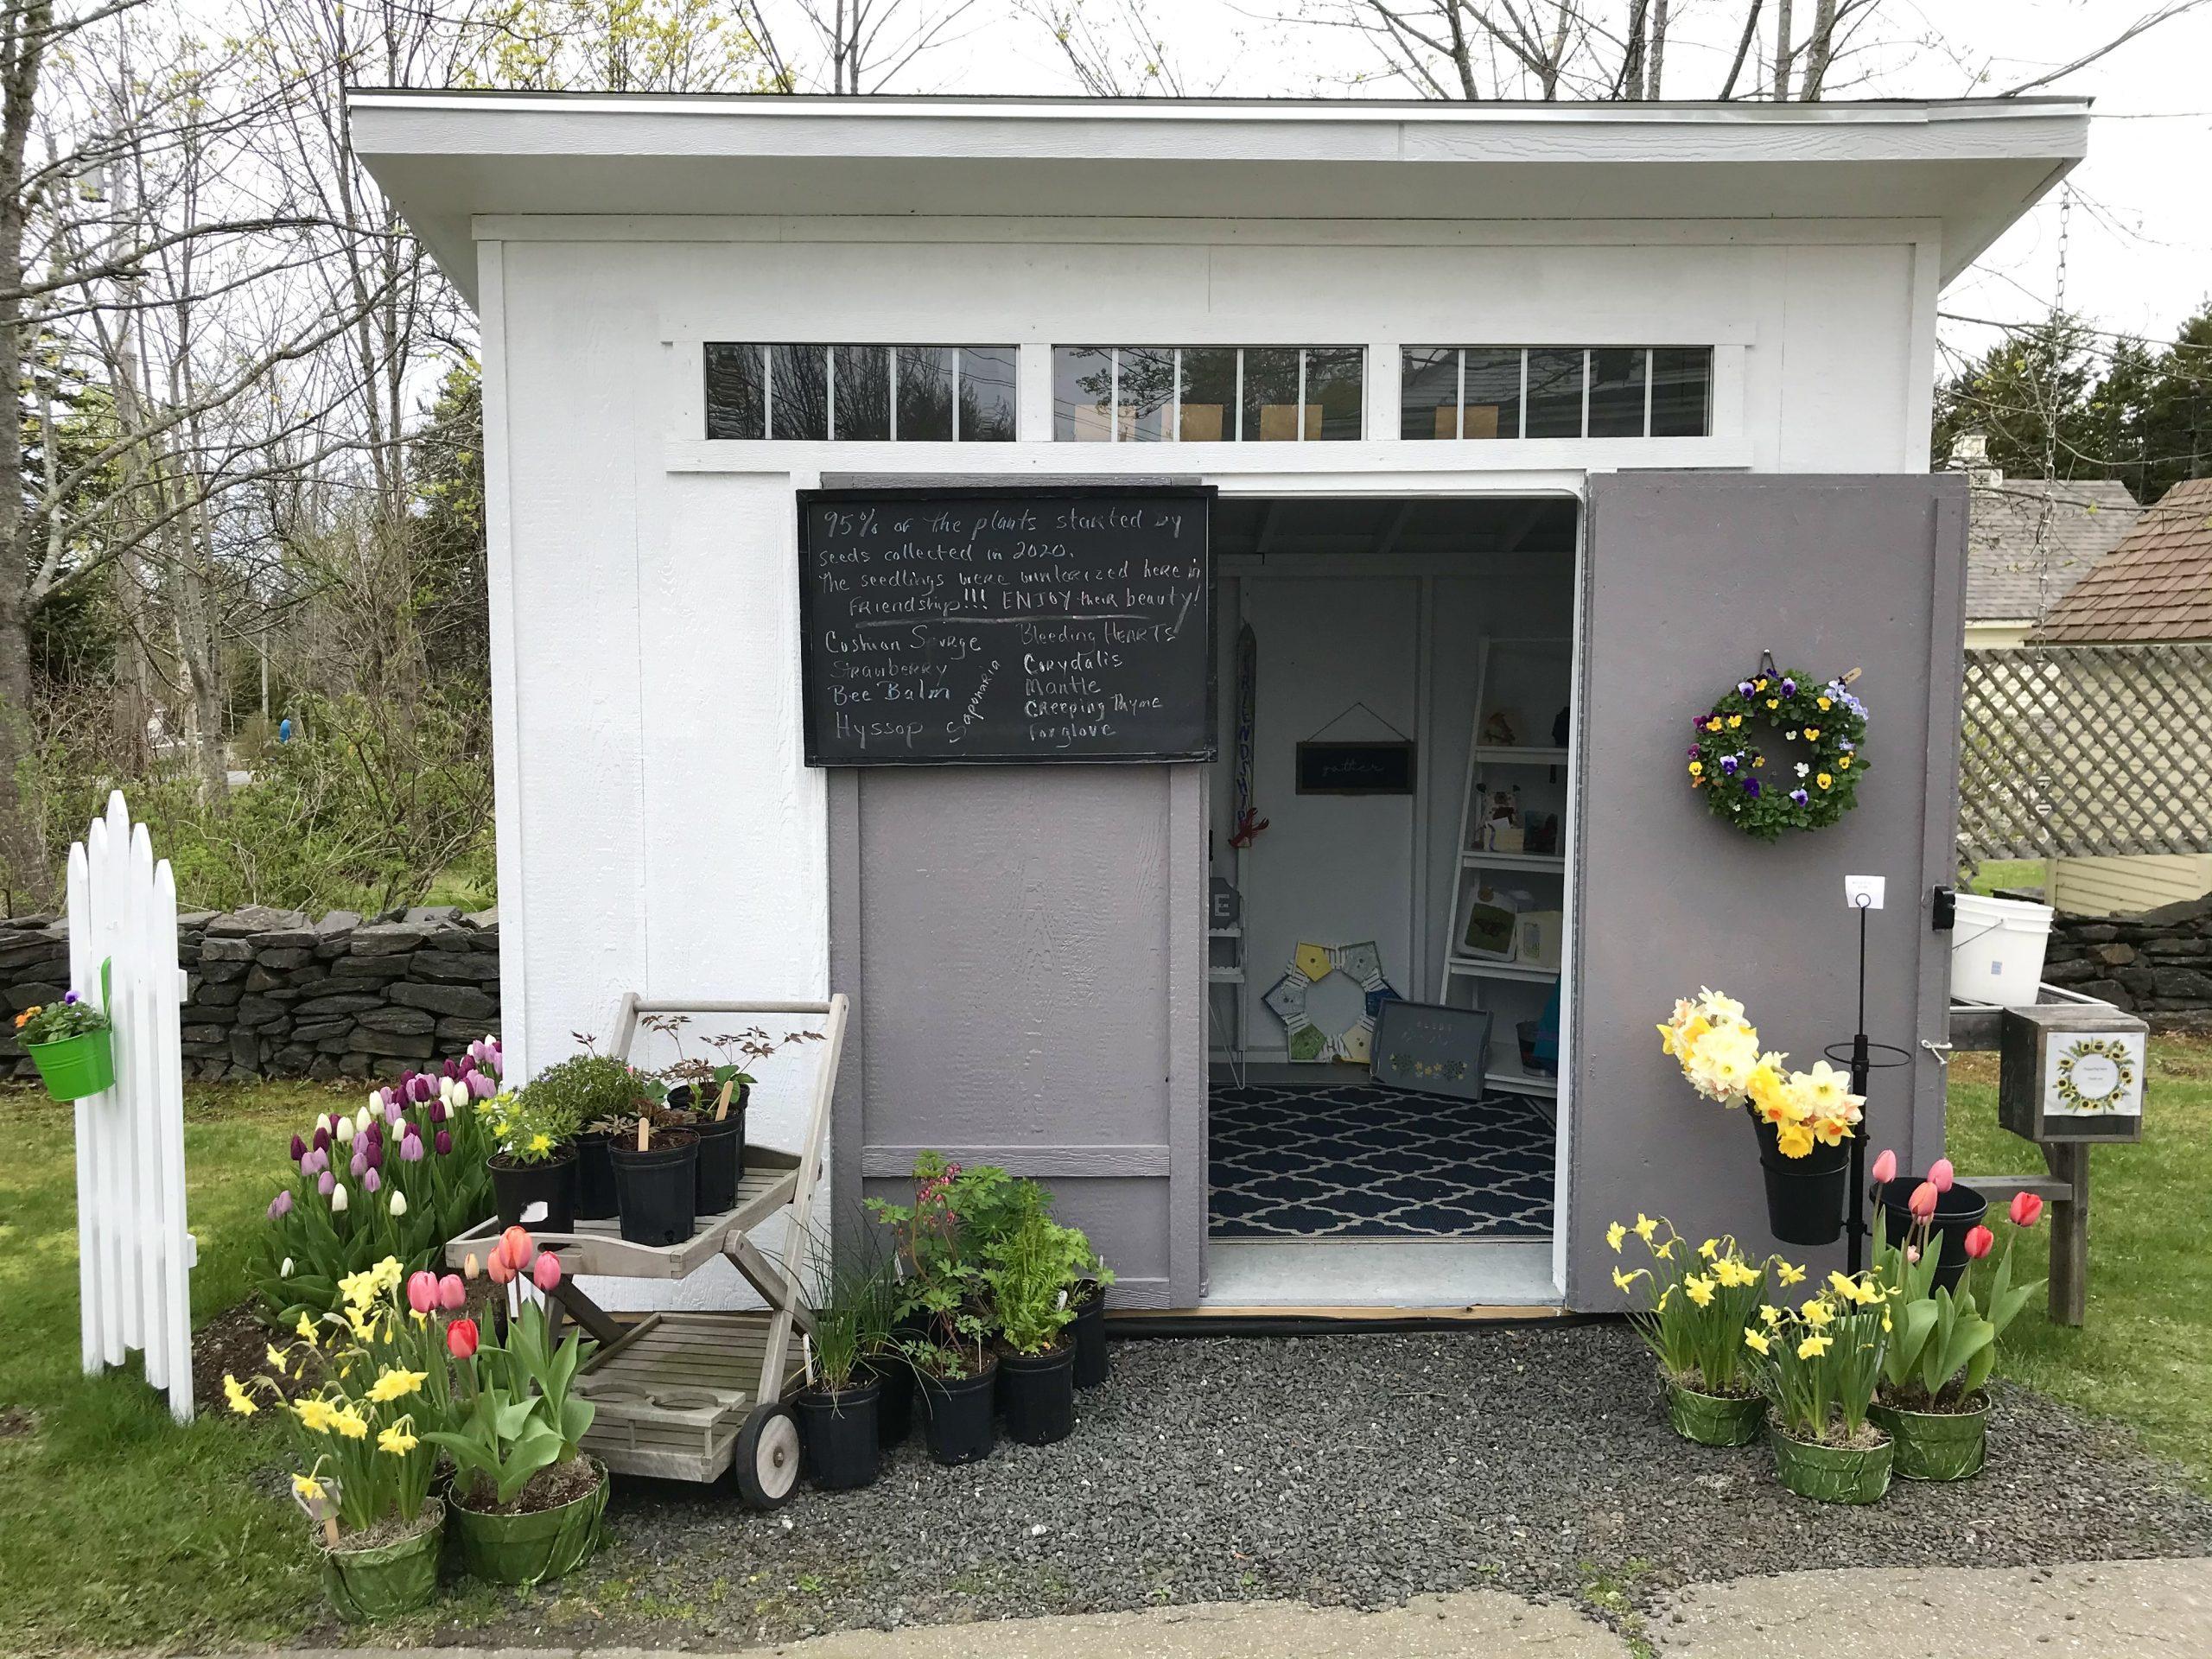 A Cute Little Roadside Flower Stand in Friendship, Maine